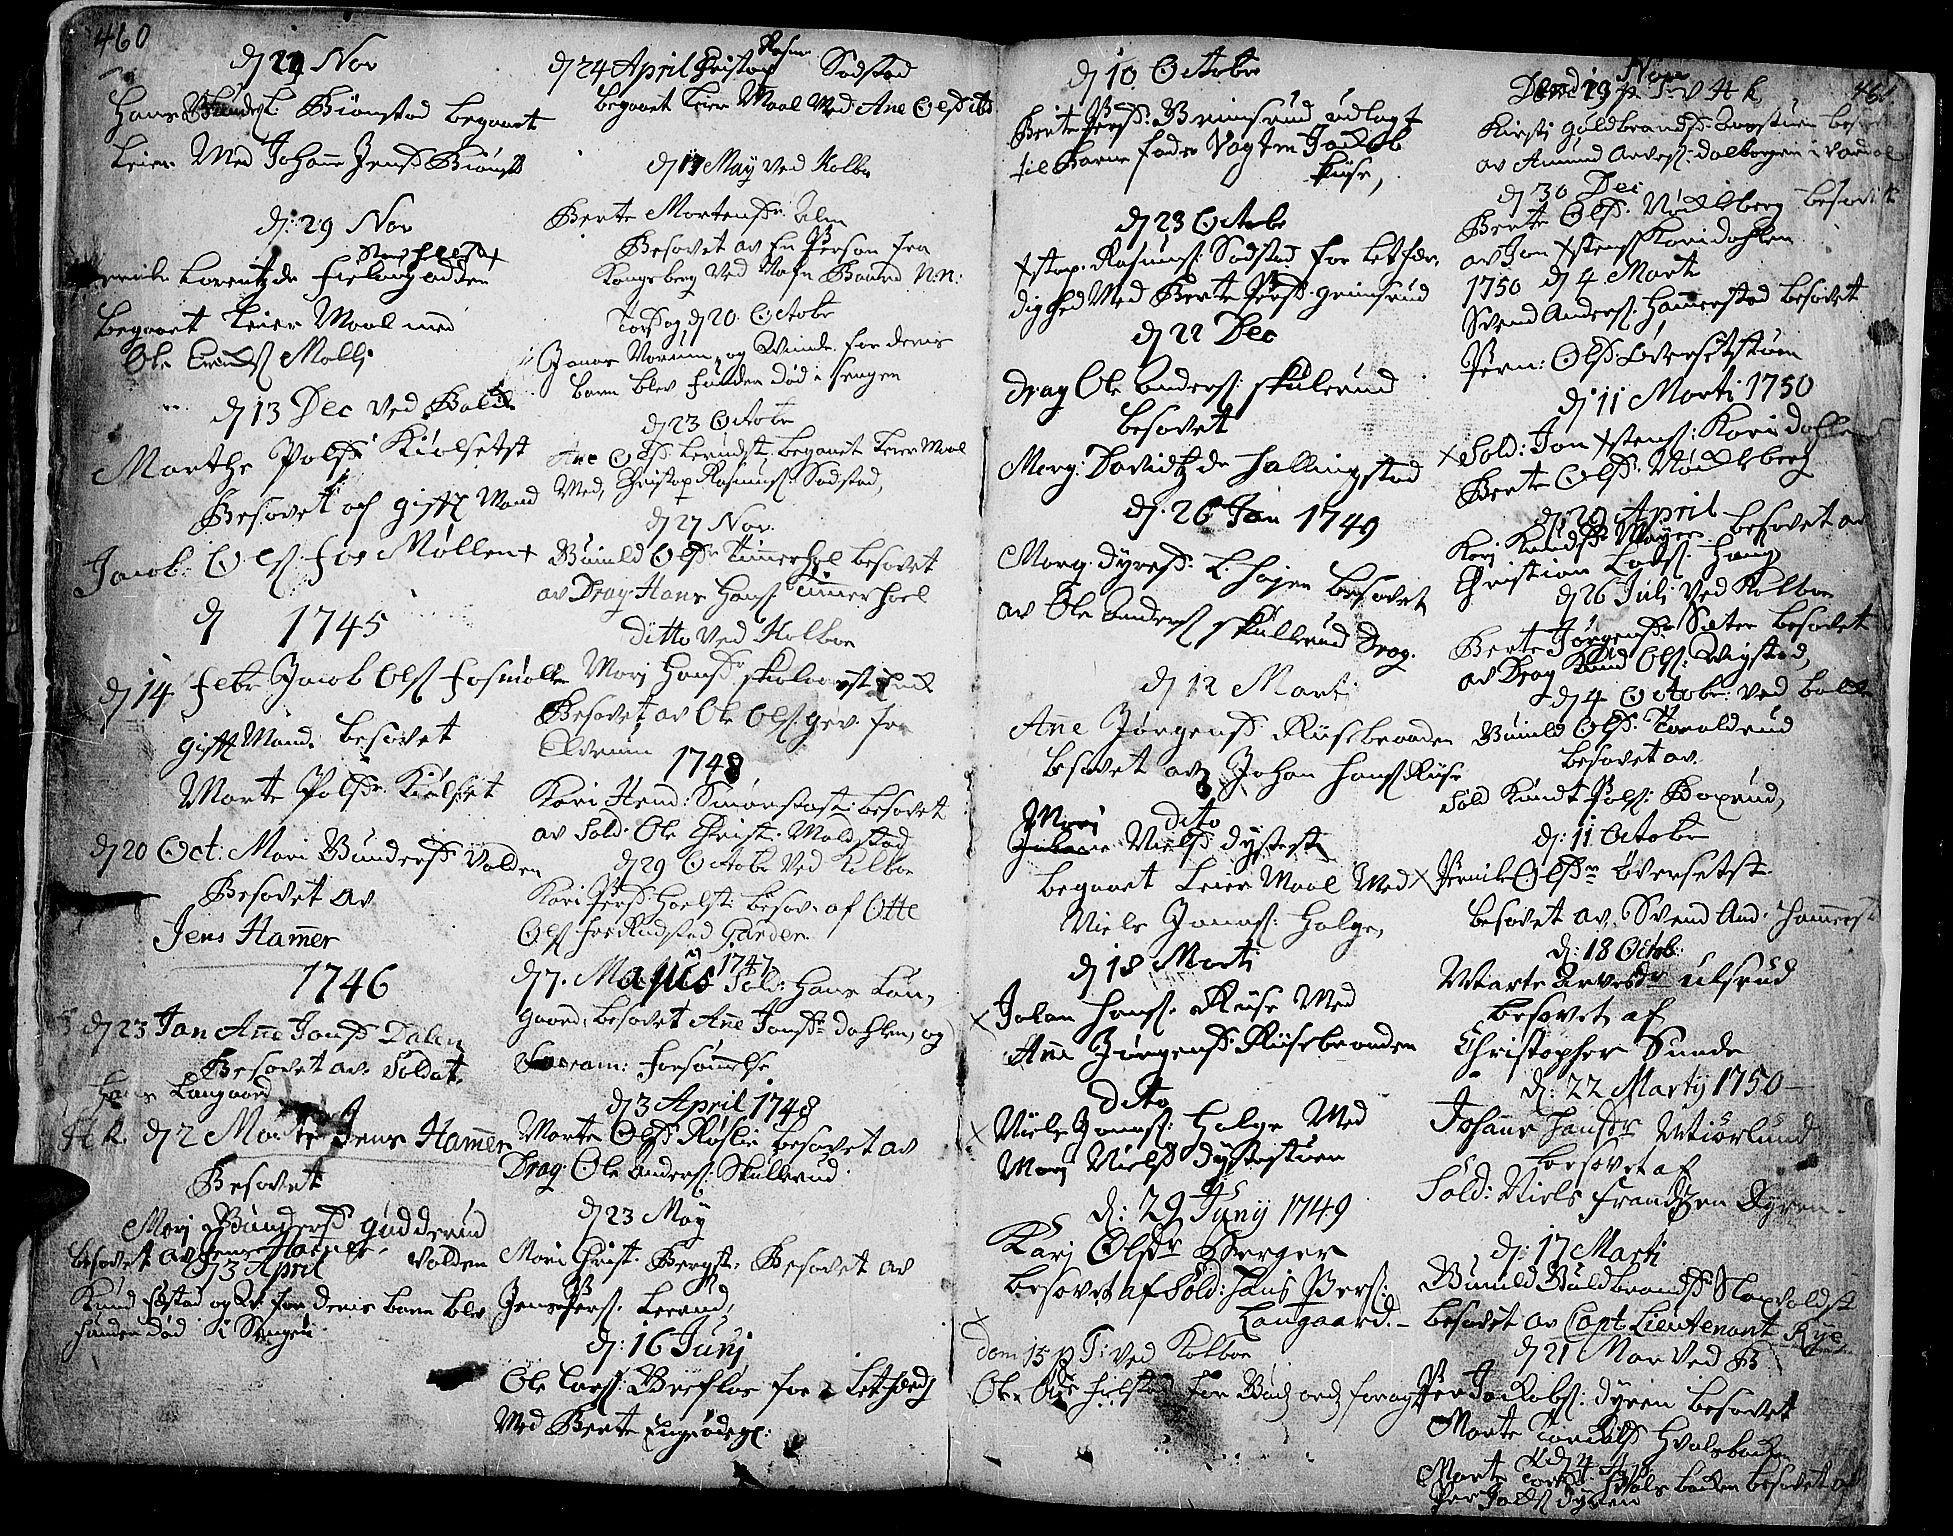 SAH, Toten prestekontor, Ministerialbok nr. 3, 1734-1751, s. 460-461